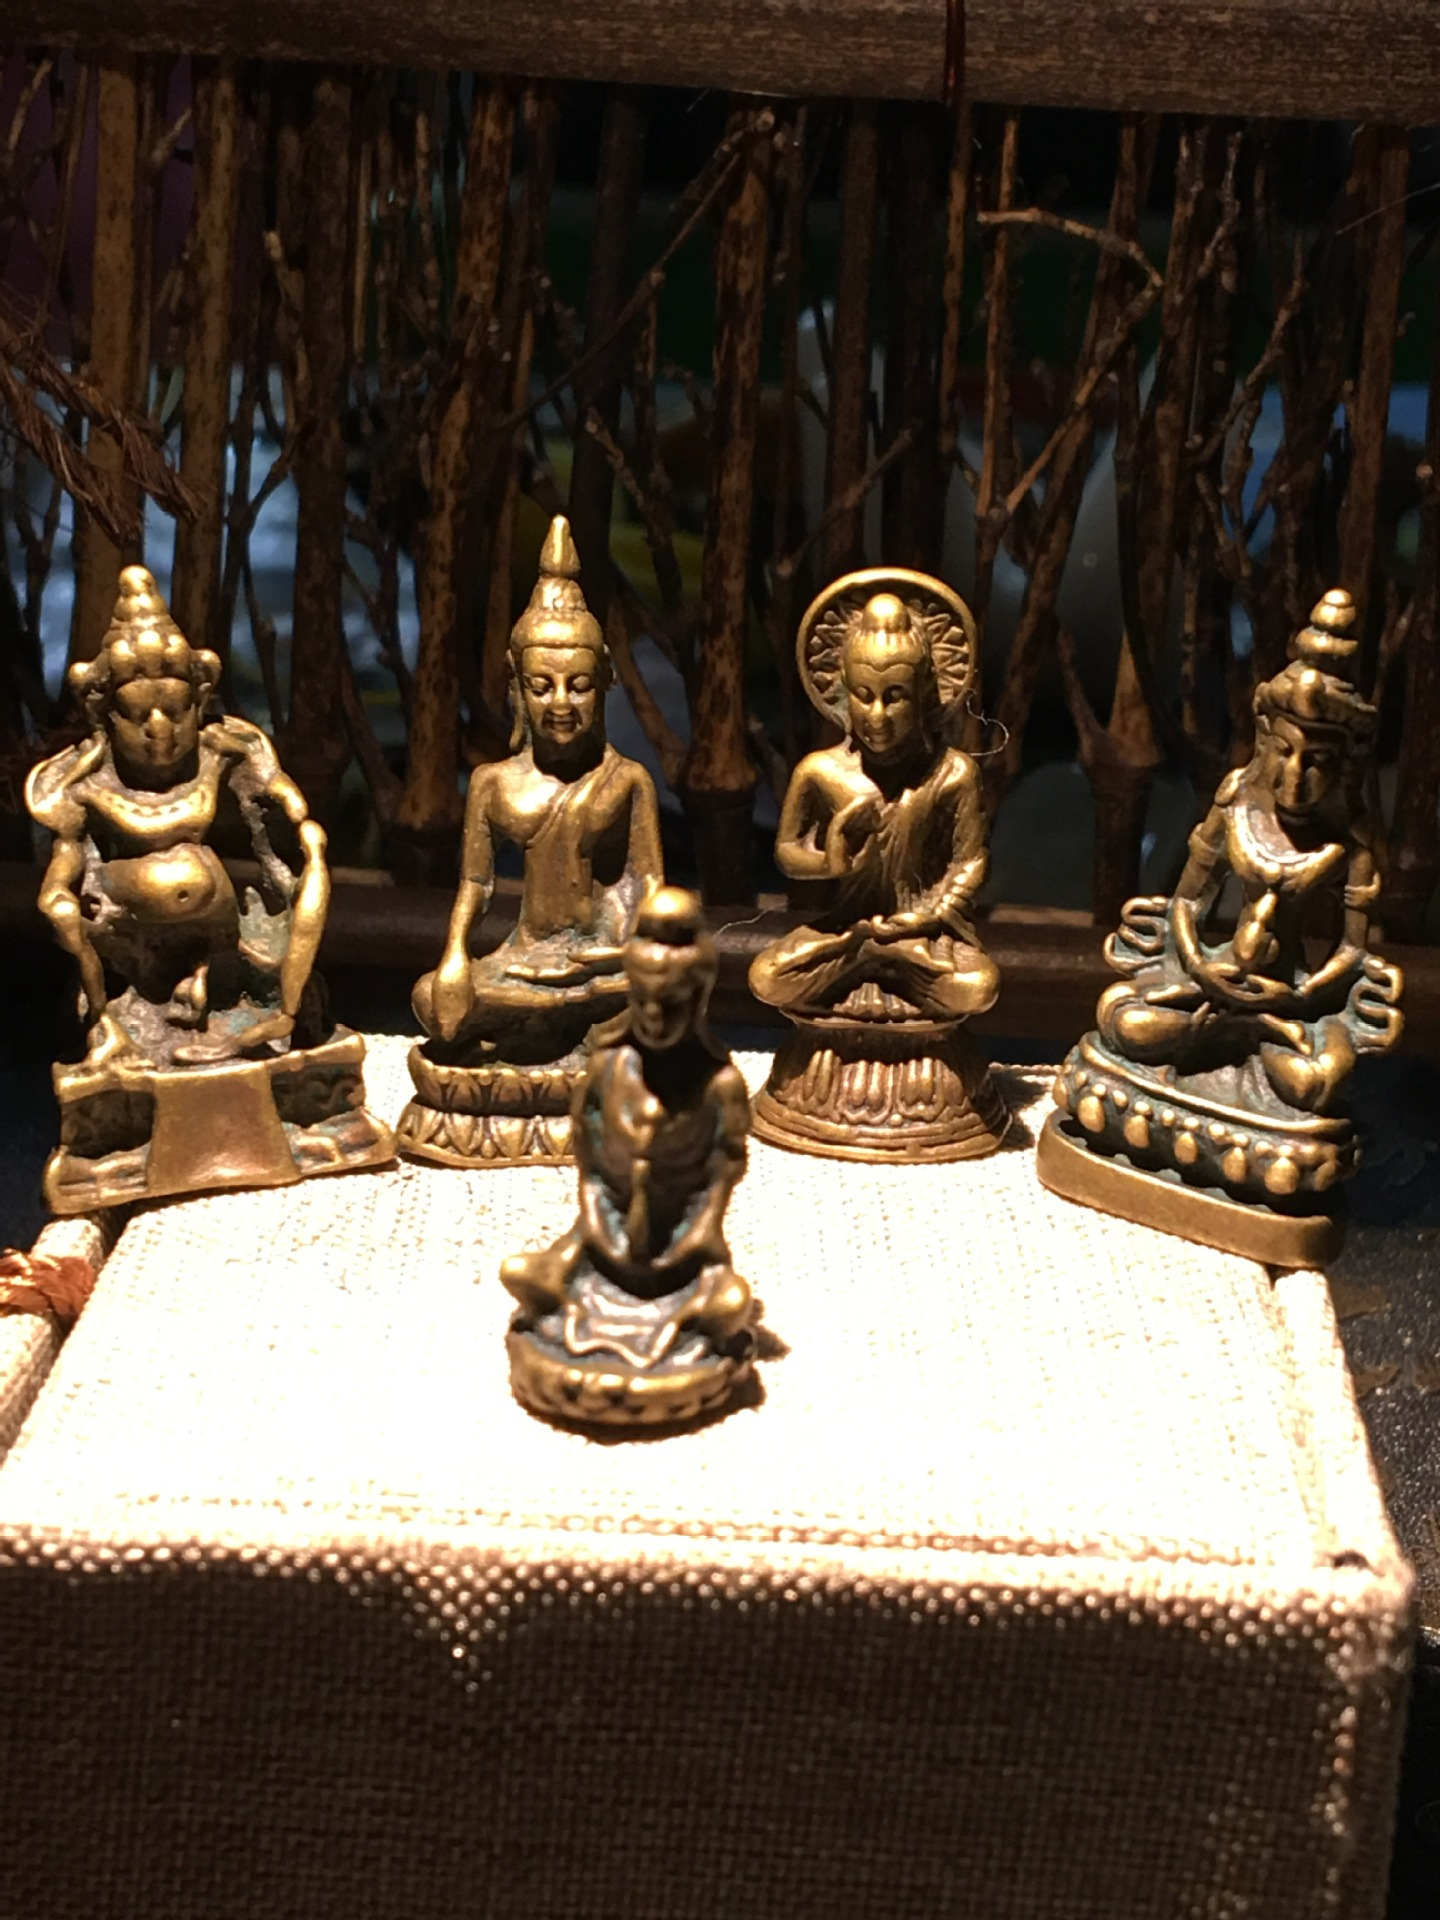 Copper Buddha Figurine Nepal Small Inch Buddha Statue To